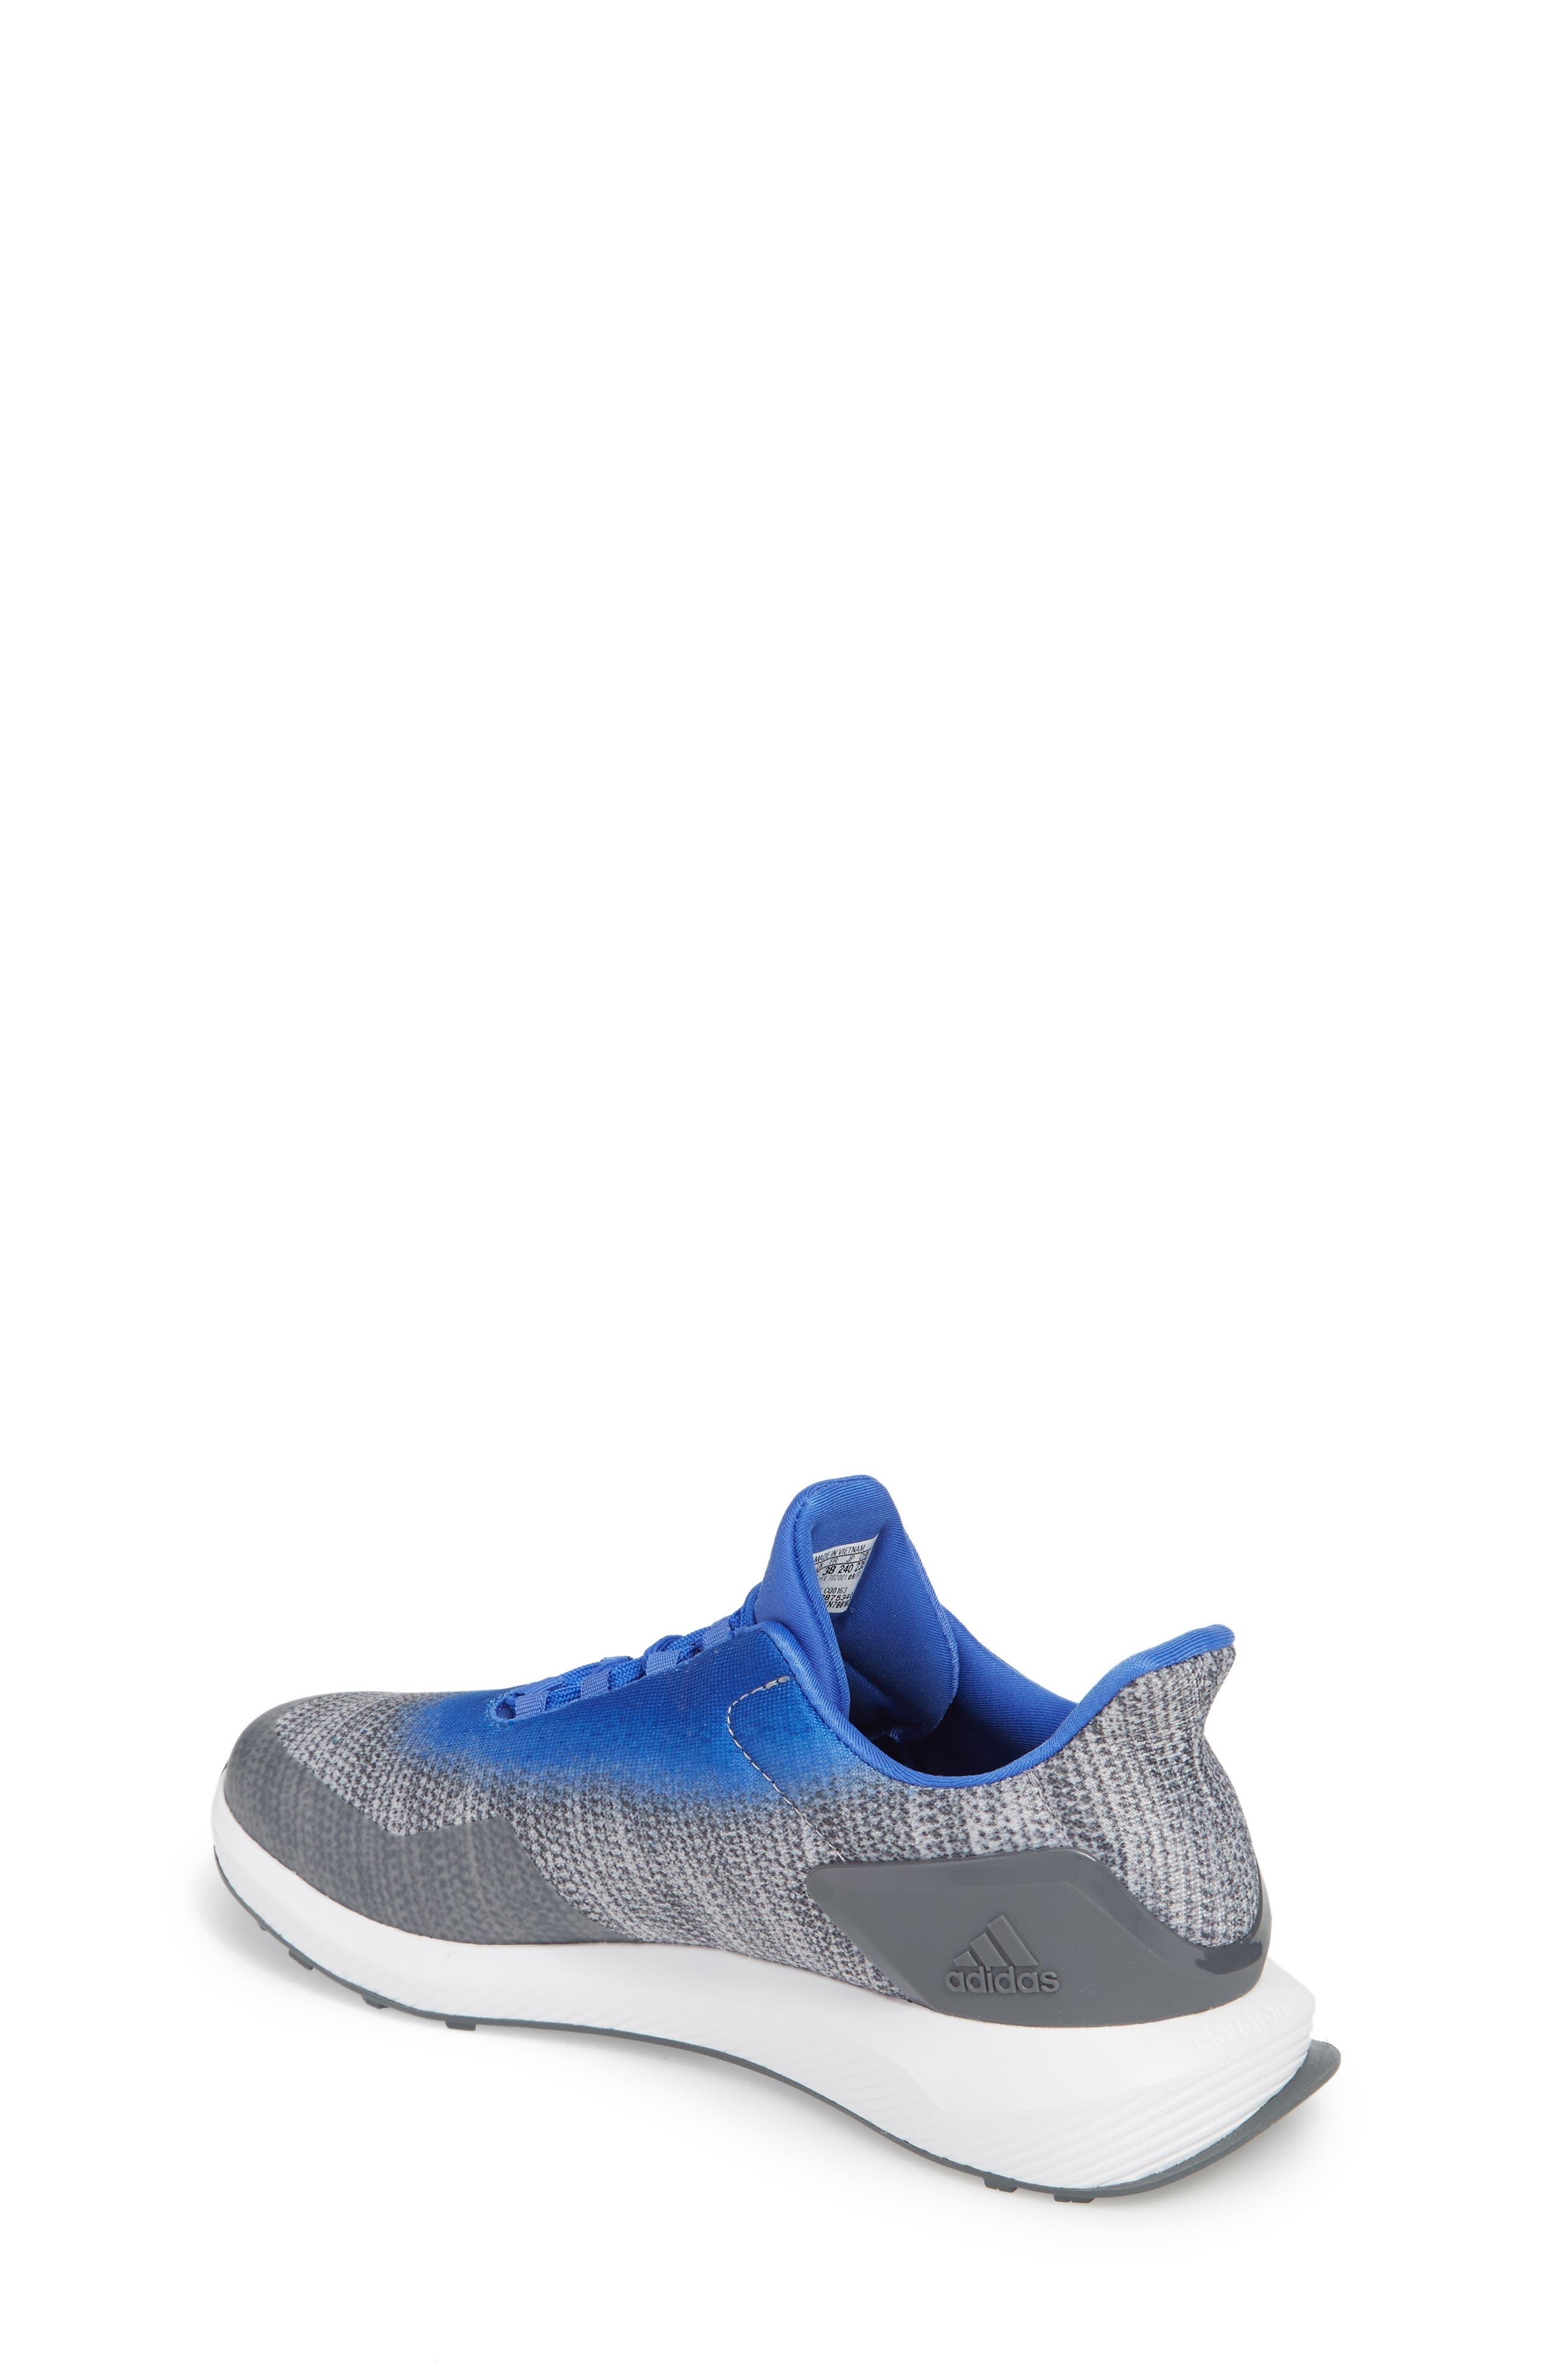 RapidaRun Uncaged Sneaker,                             Alternate thumbnail 2, color,                             021